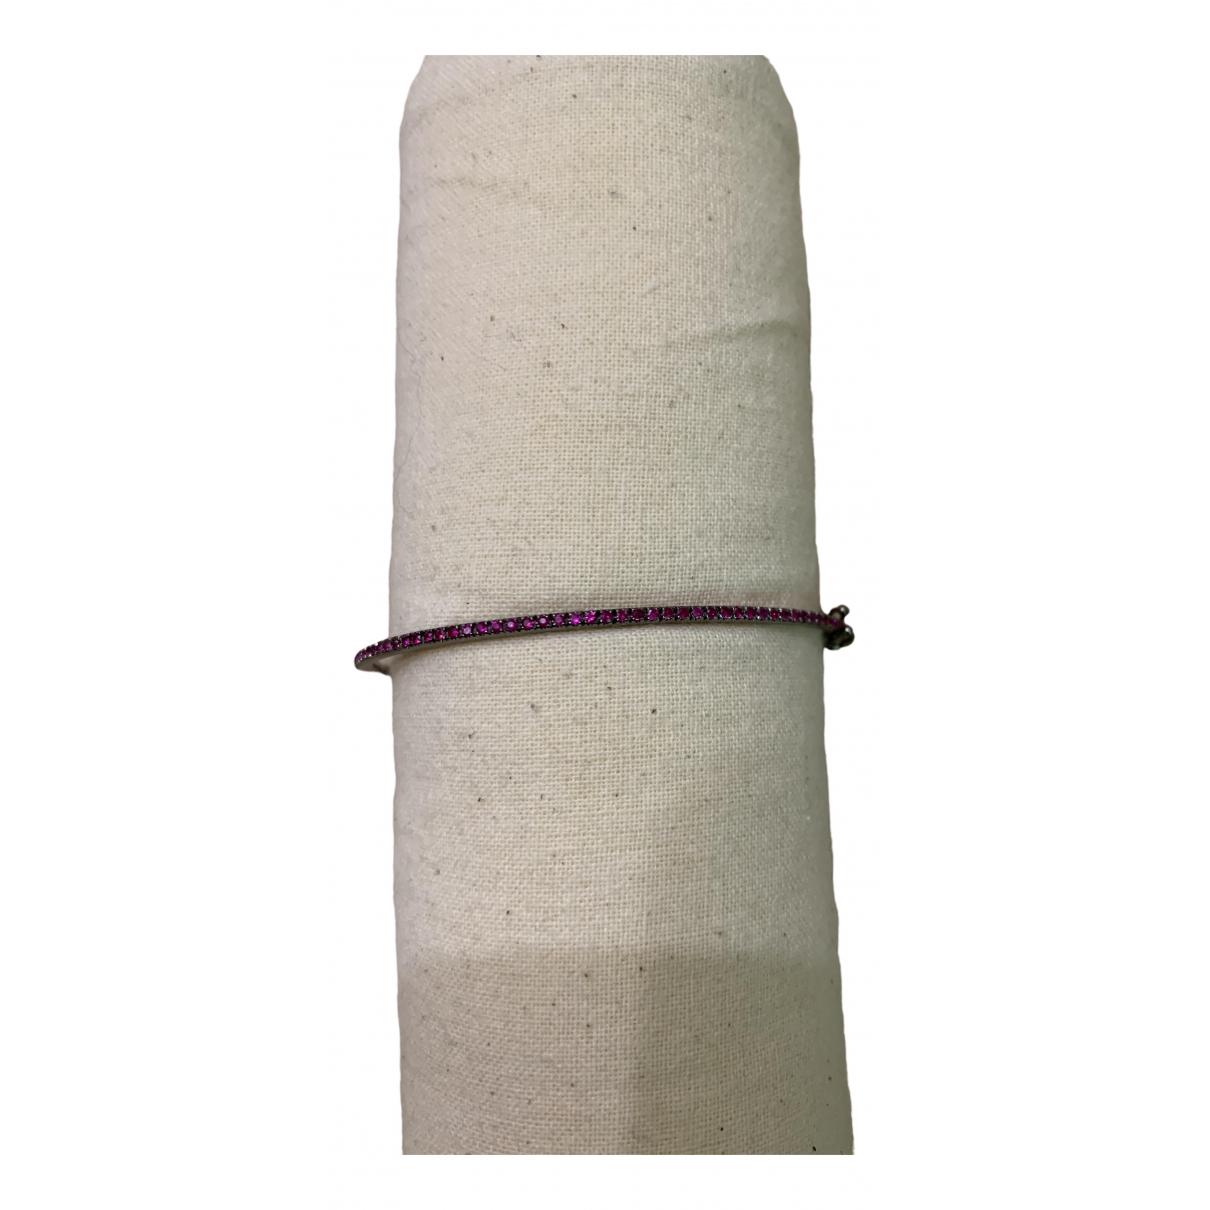 Shay Jewelry - Bracelet   pour femme en or blanc - rose